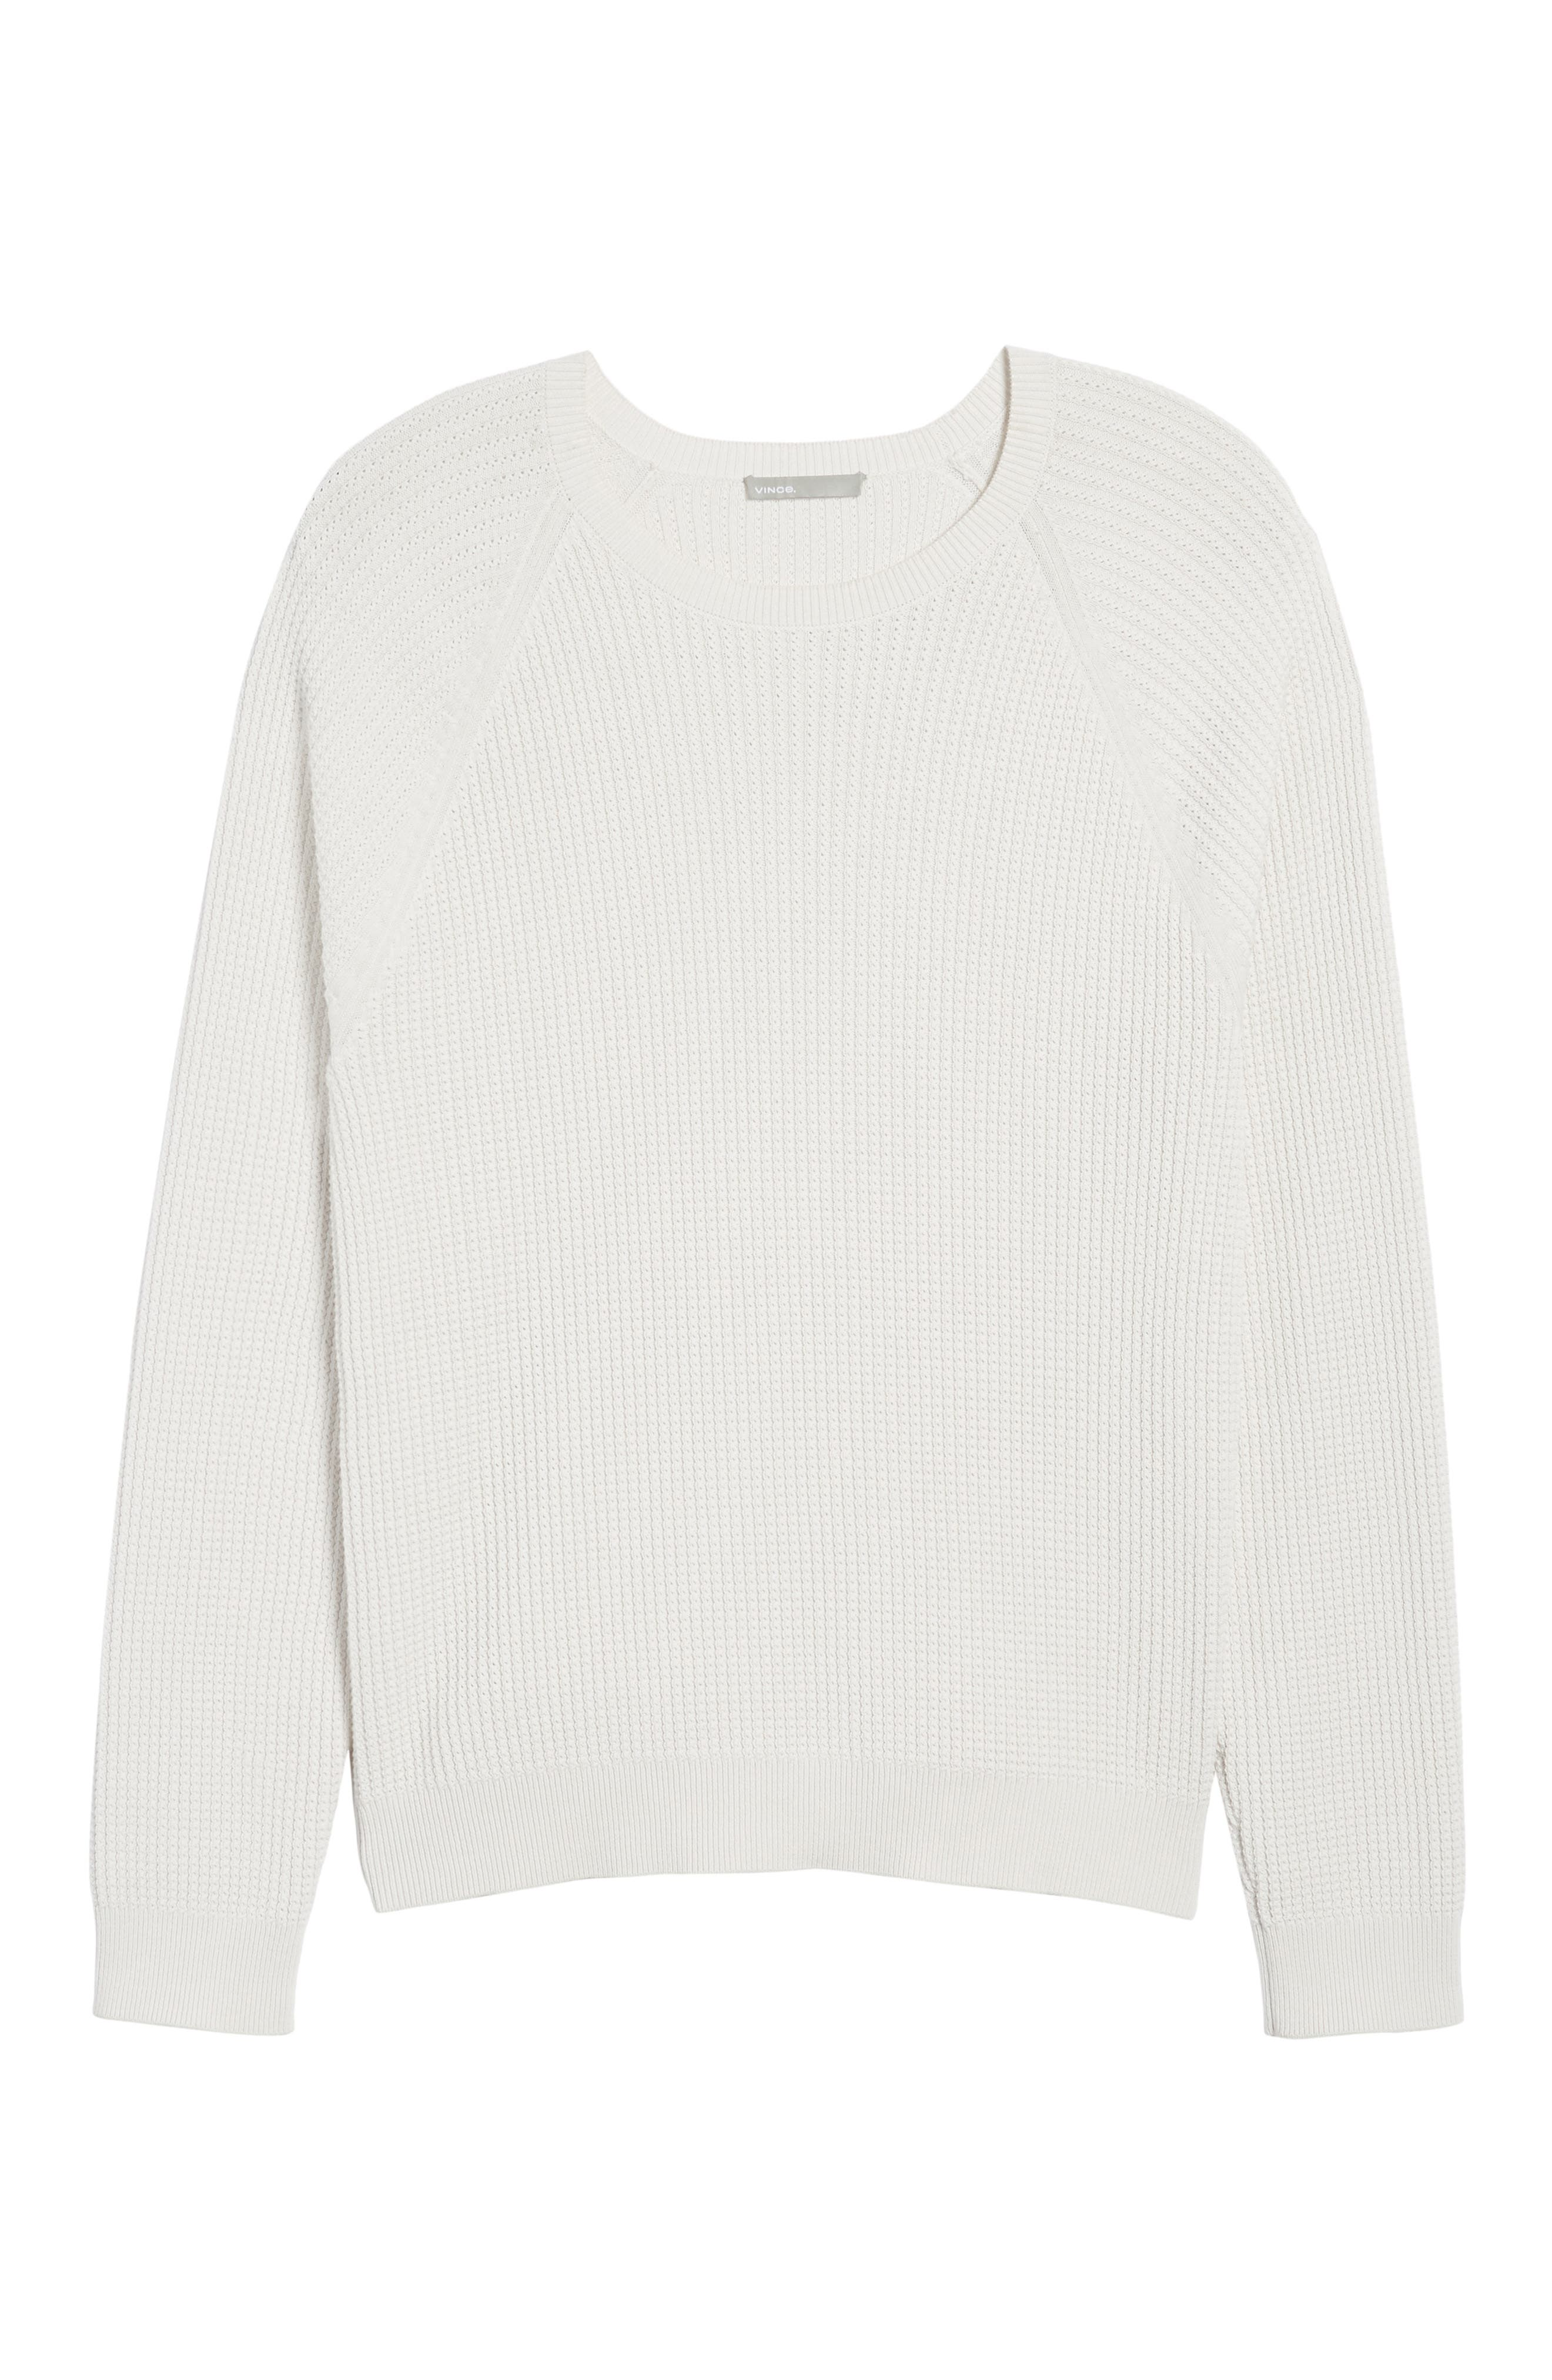 Slim Fit Thermal Knit Raglan Sweater,                             Alternate thumbnail 6, color,                             100